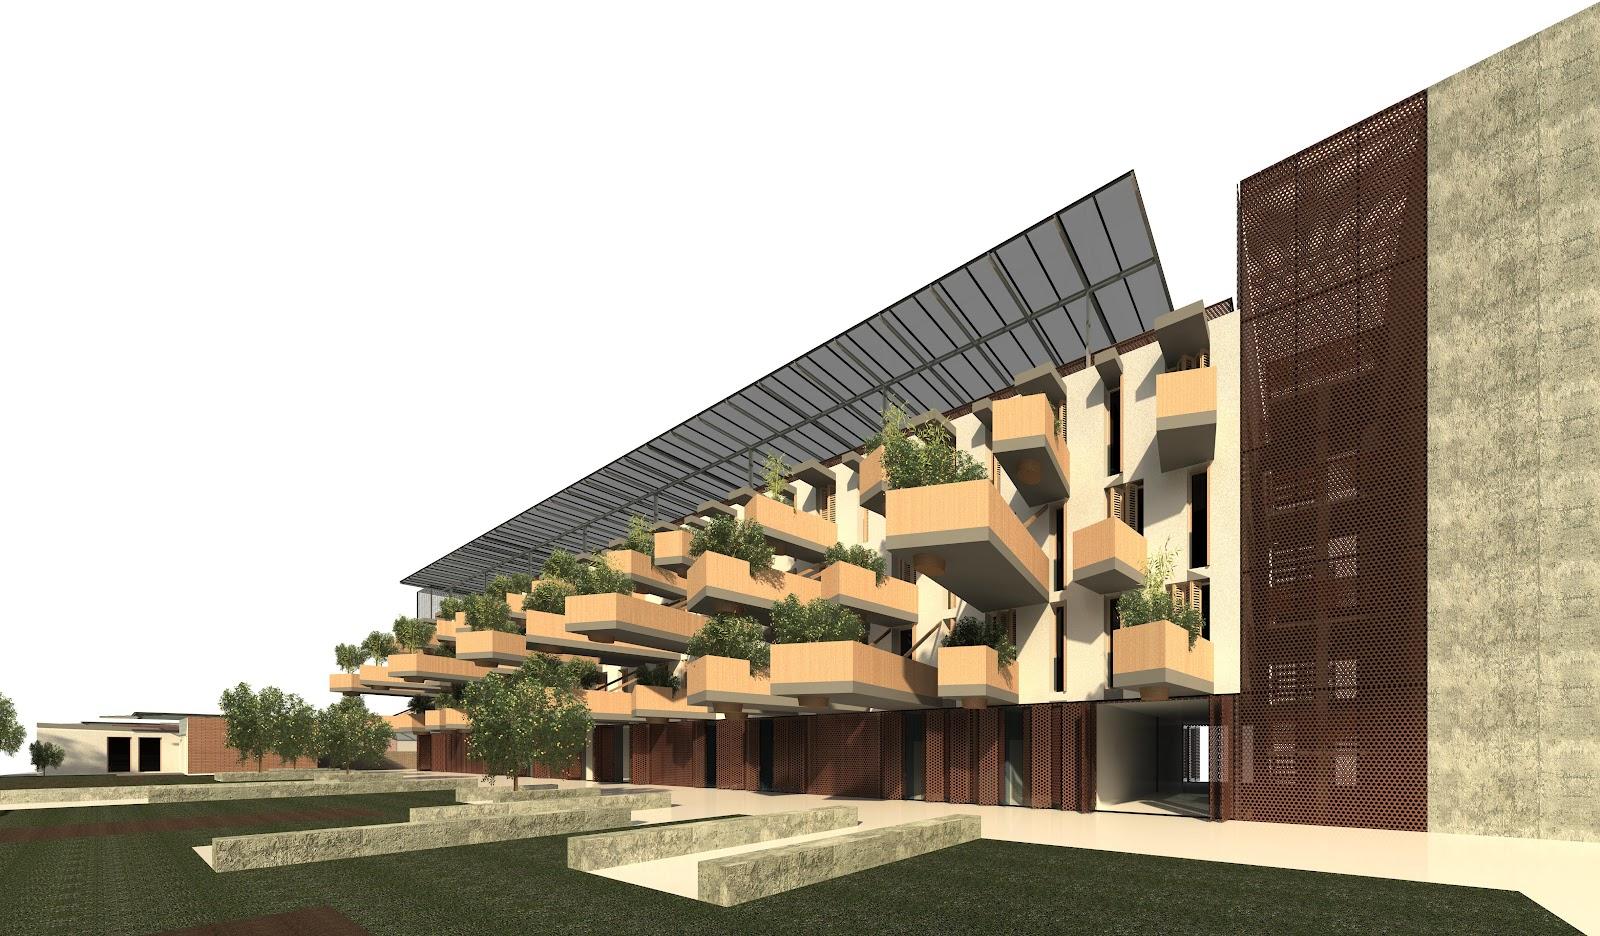 Hortus social housing a porta portese dal lab iv di - Porta portese sud ...